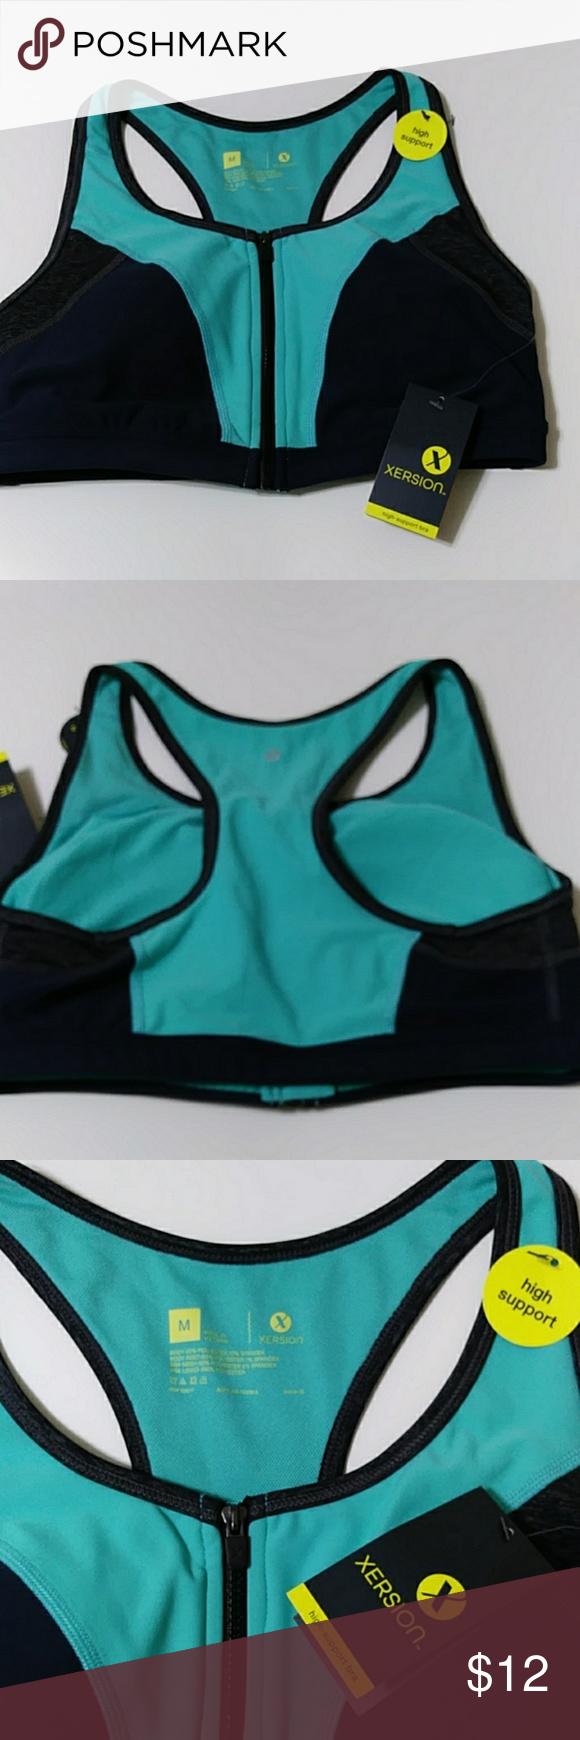 New Xersion Sports Bra Sports bra, High support sports